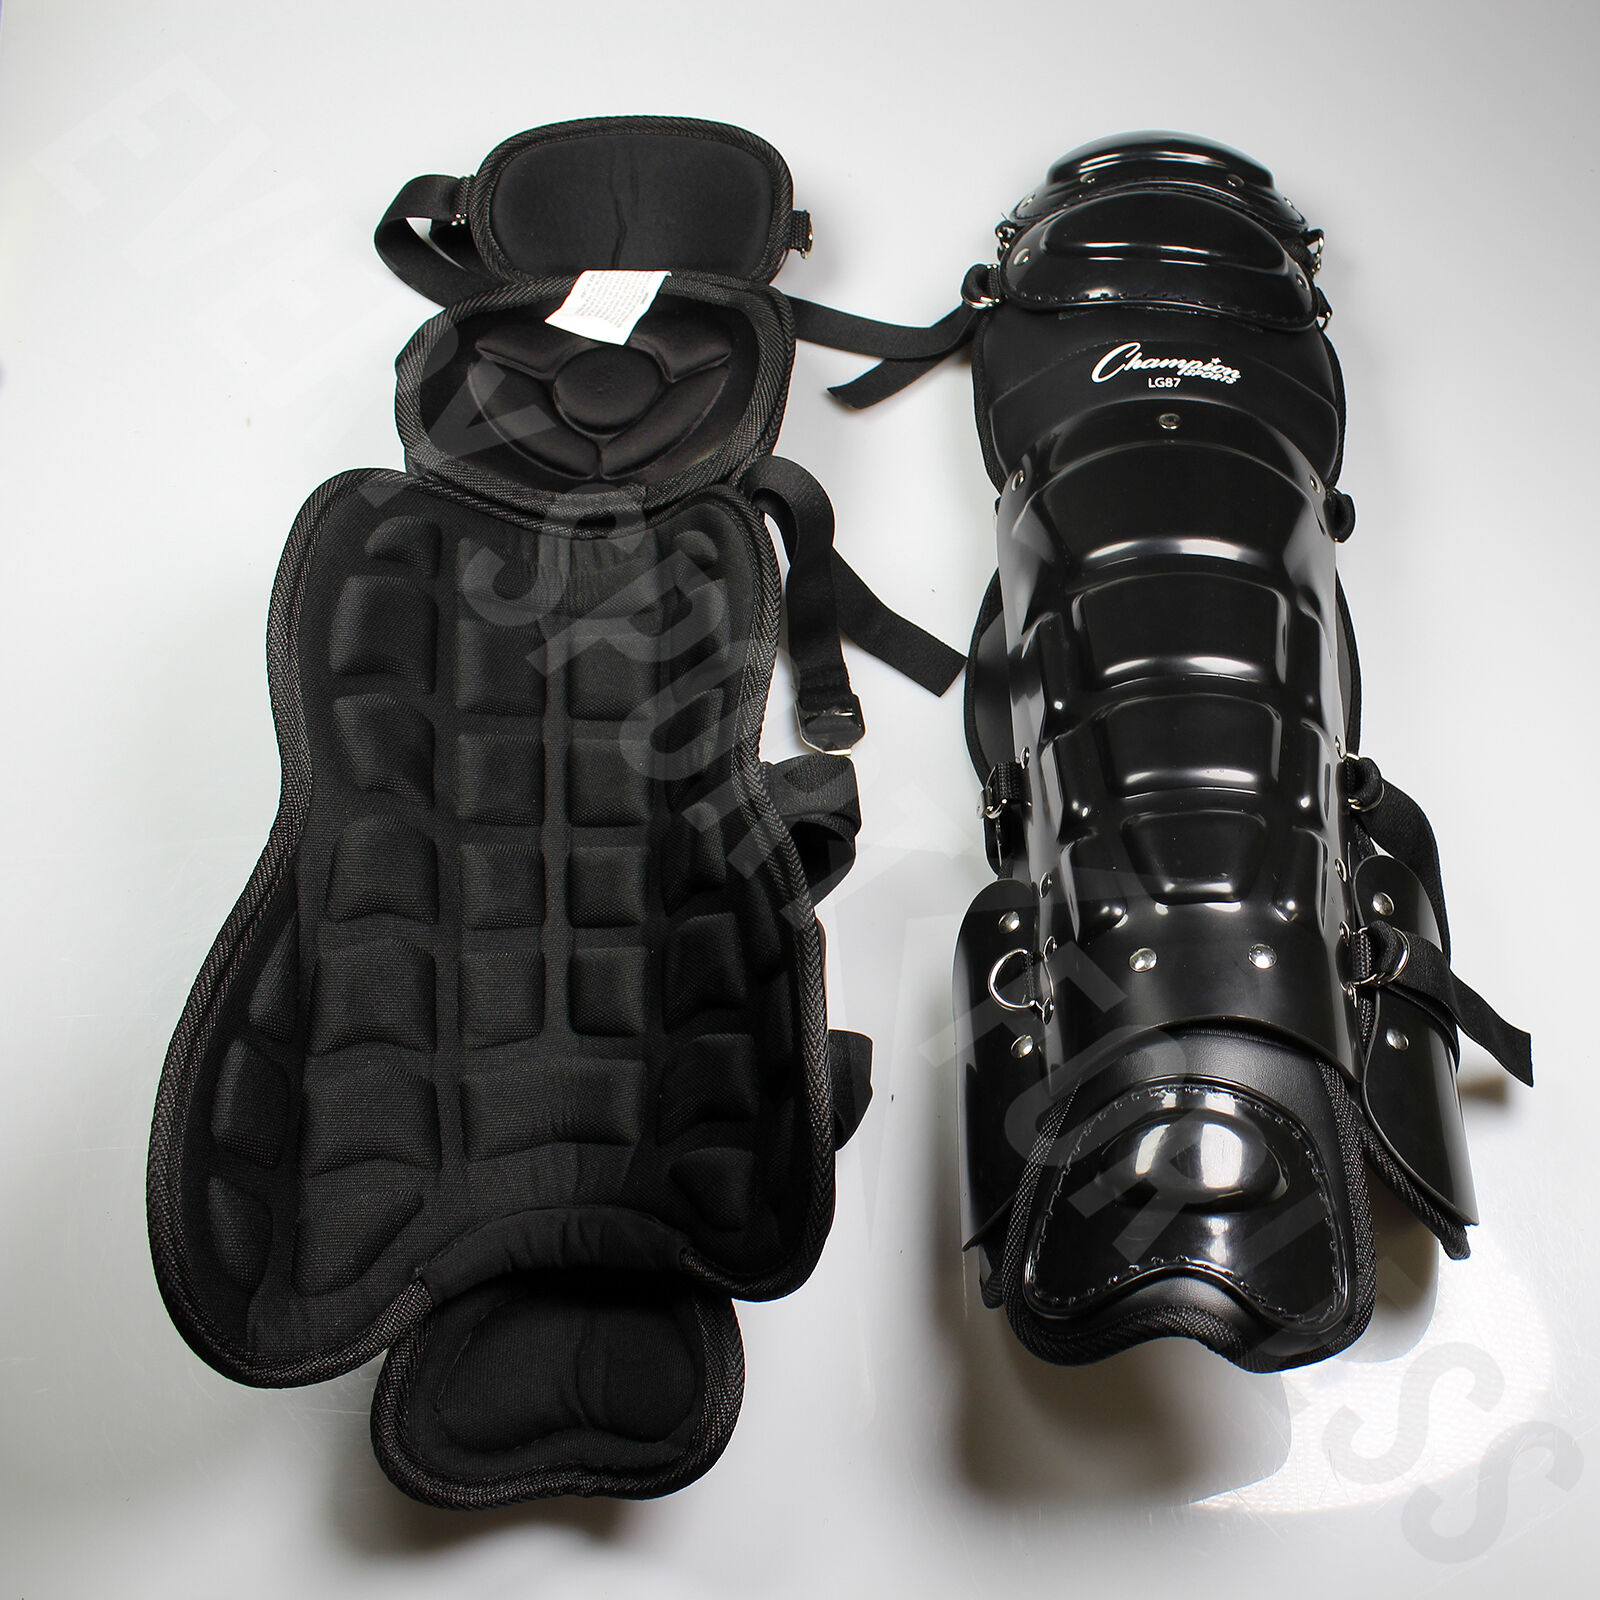 Champion Pro Style Umpire's Umpire's Umpire's Leg Guards 15-18  Adjustable LG87 (NEW) b12d51